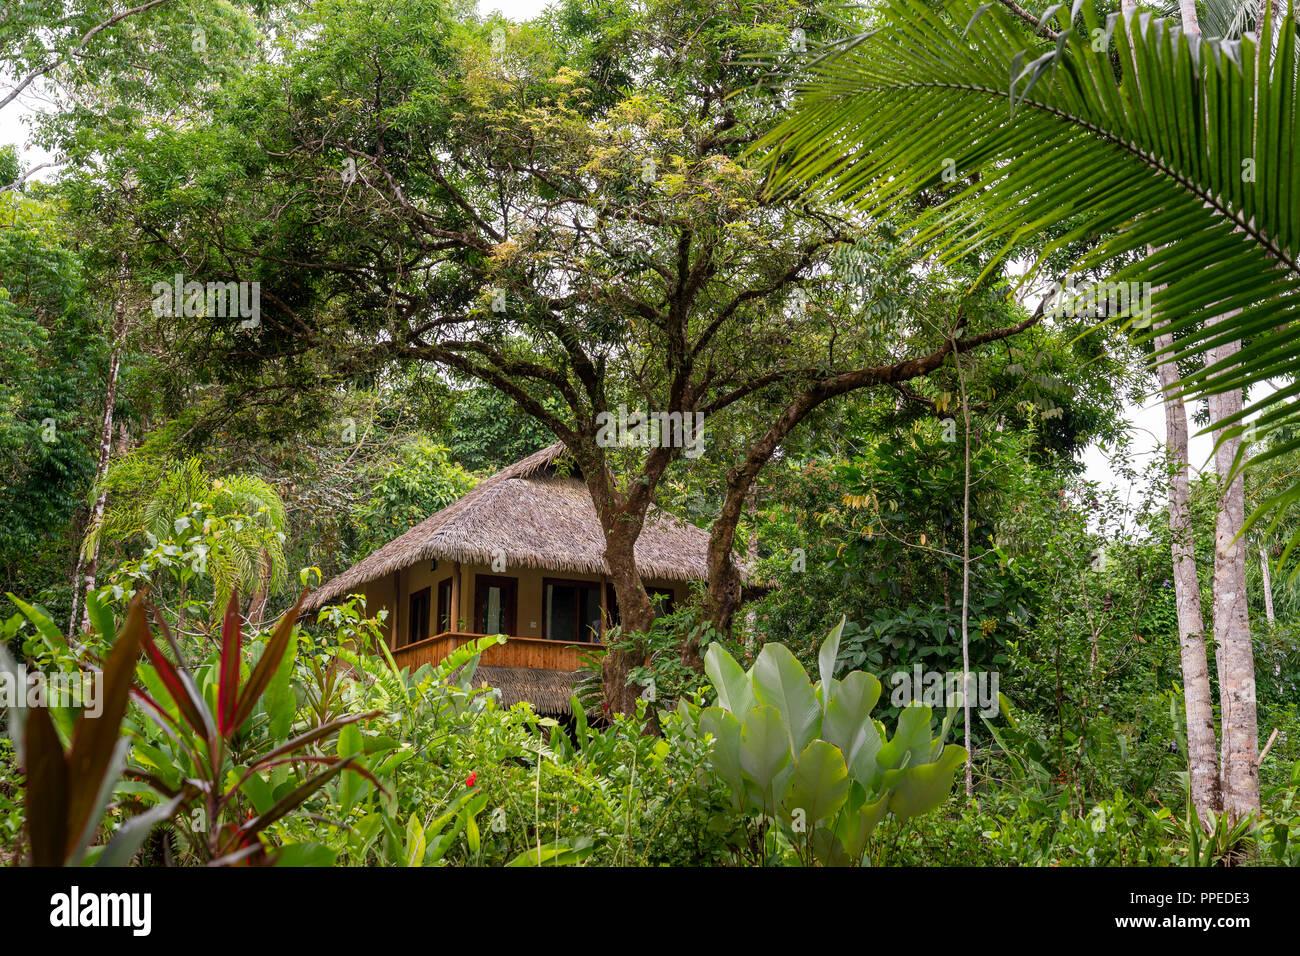 La selva tropical, el Parque Nacional Corcovado, Península de Osa, Costa Rica Foto de stock